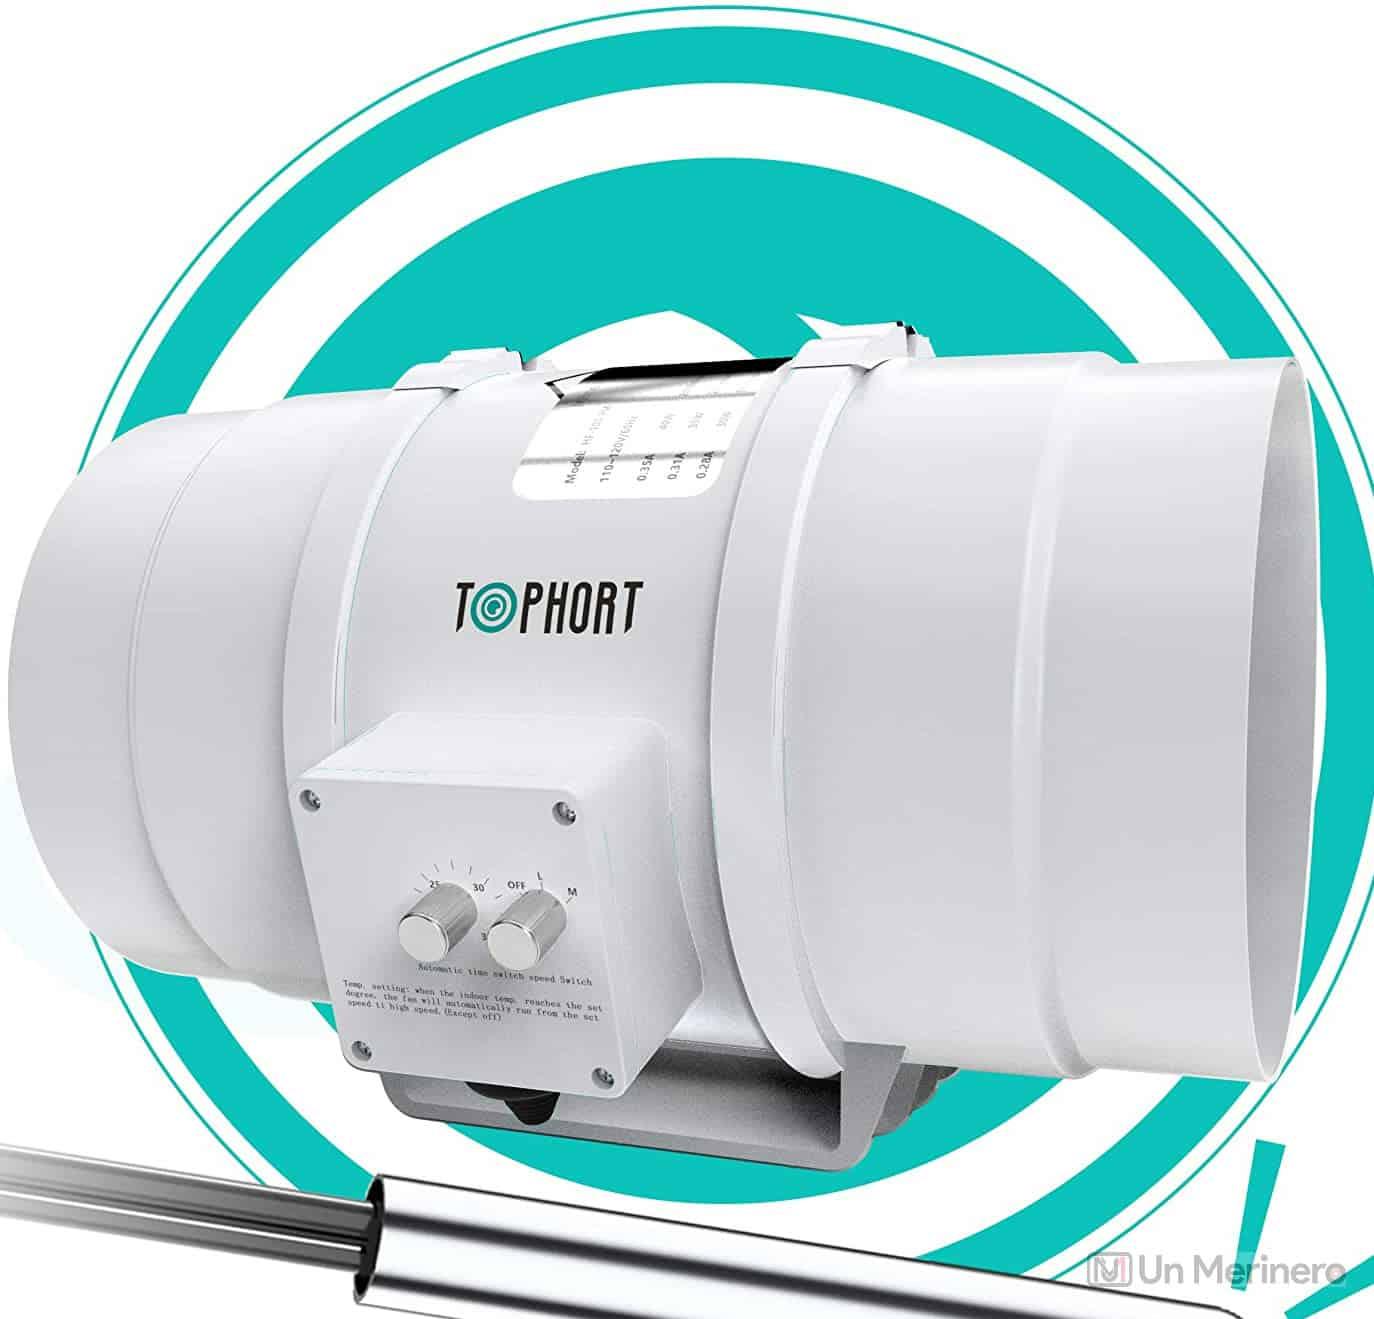 TOPHORT Booster Inline Exhaust Fan - best exhaust fan for 10x10 grow tent